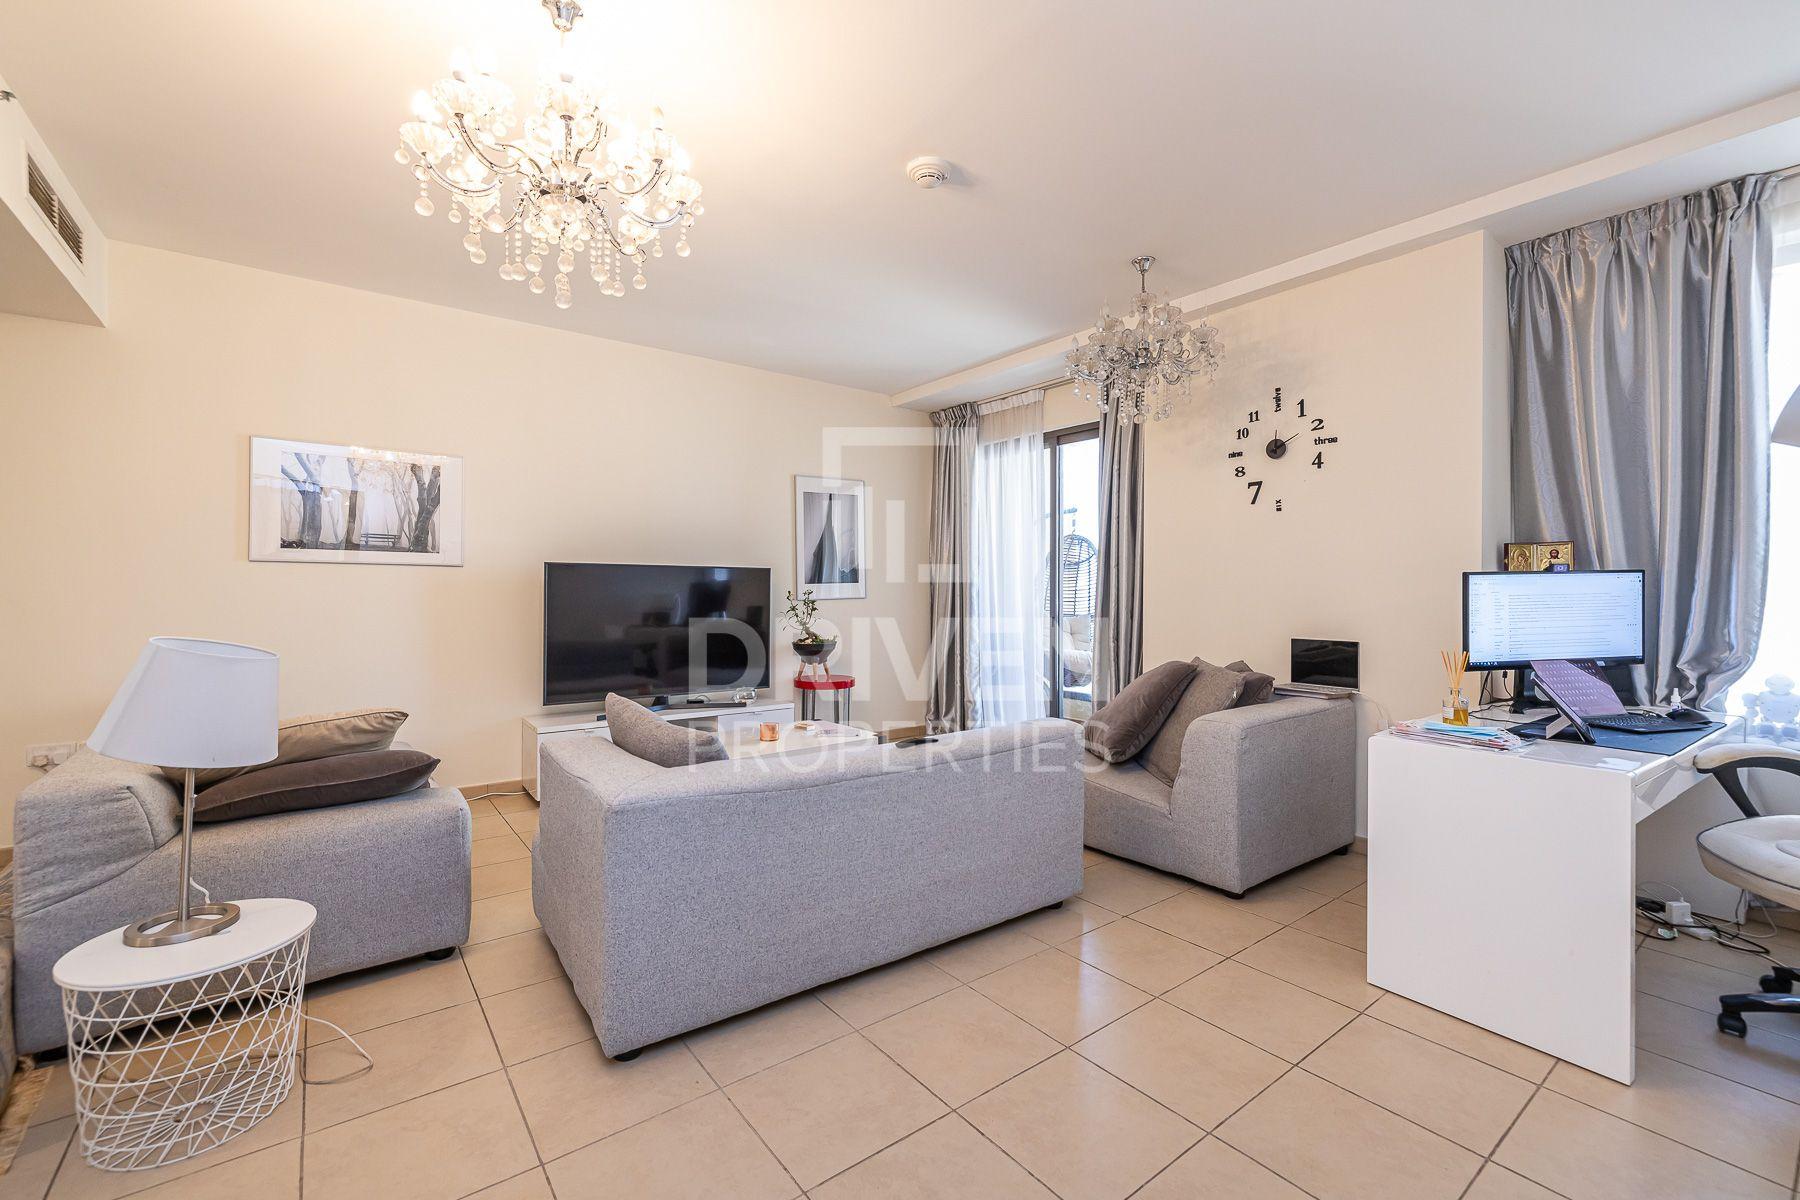 Apartment for Rent in Murjan 1 - Jumeirah Beach Residence